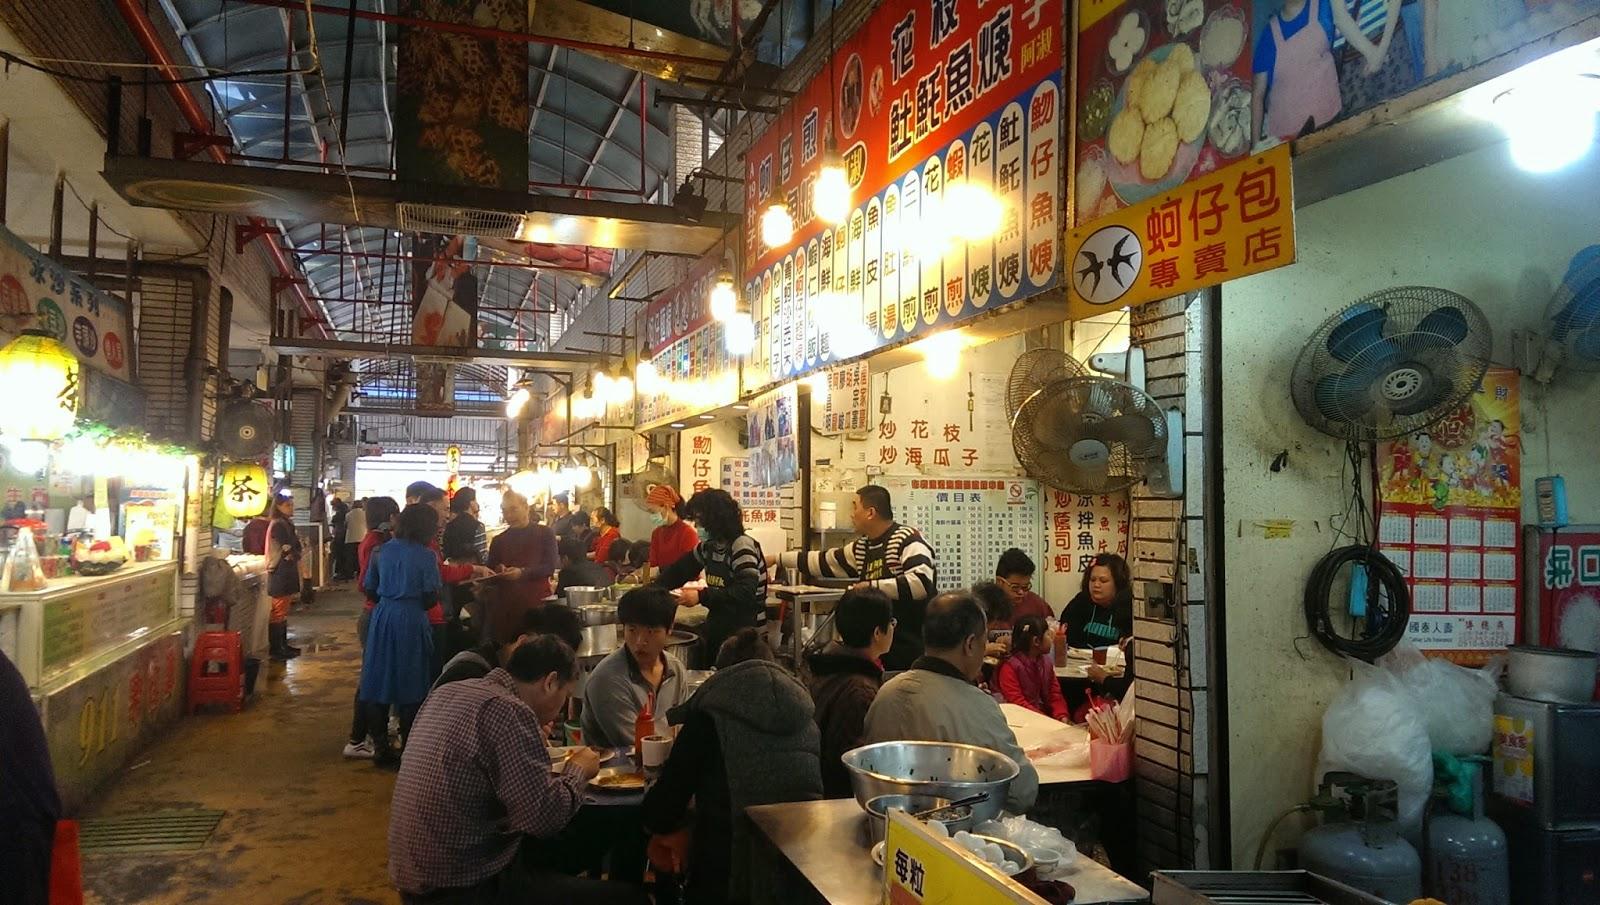 2015 02 02%2B13.25.29 - [食記] 葉家生魚片 - 布袋觀光漁市中的鮮魚餐廳